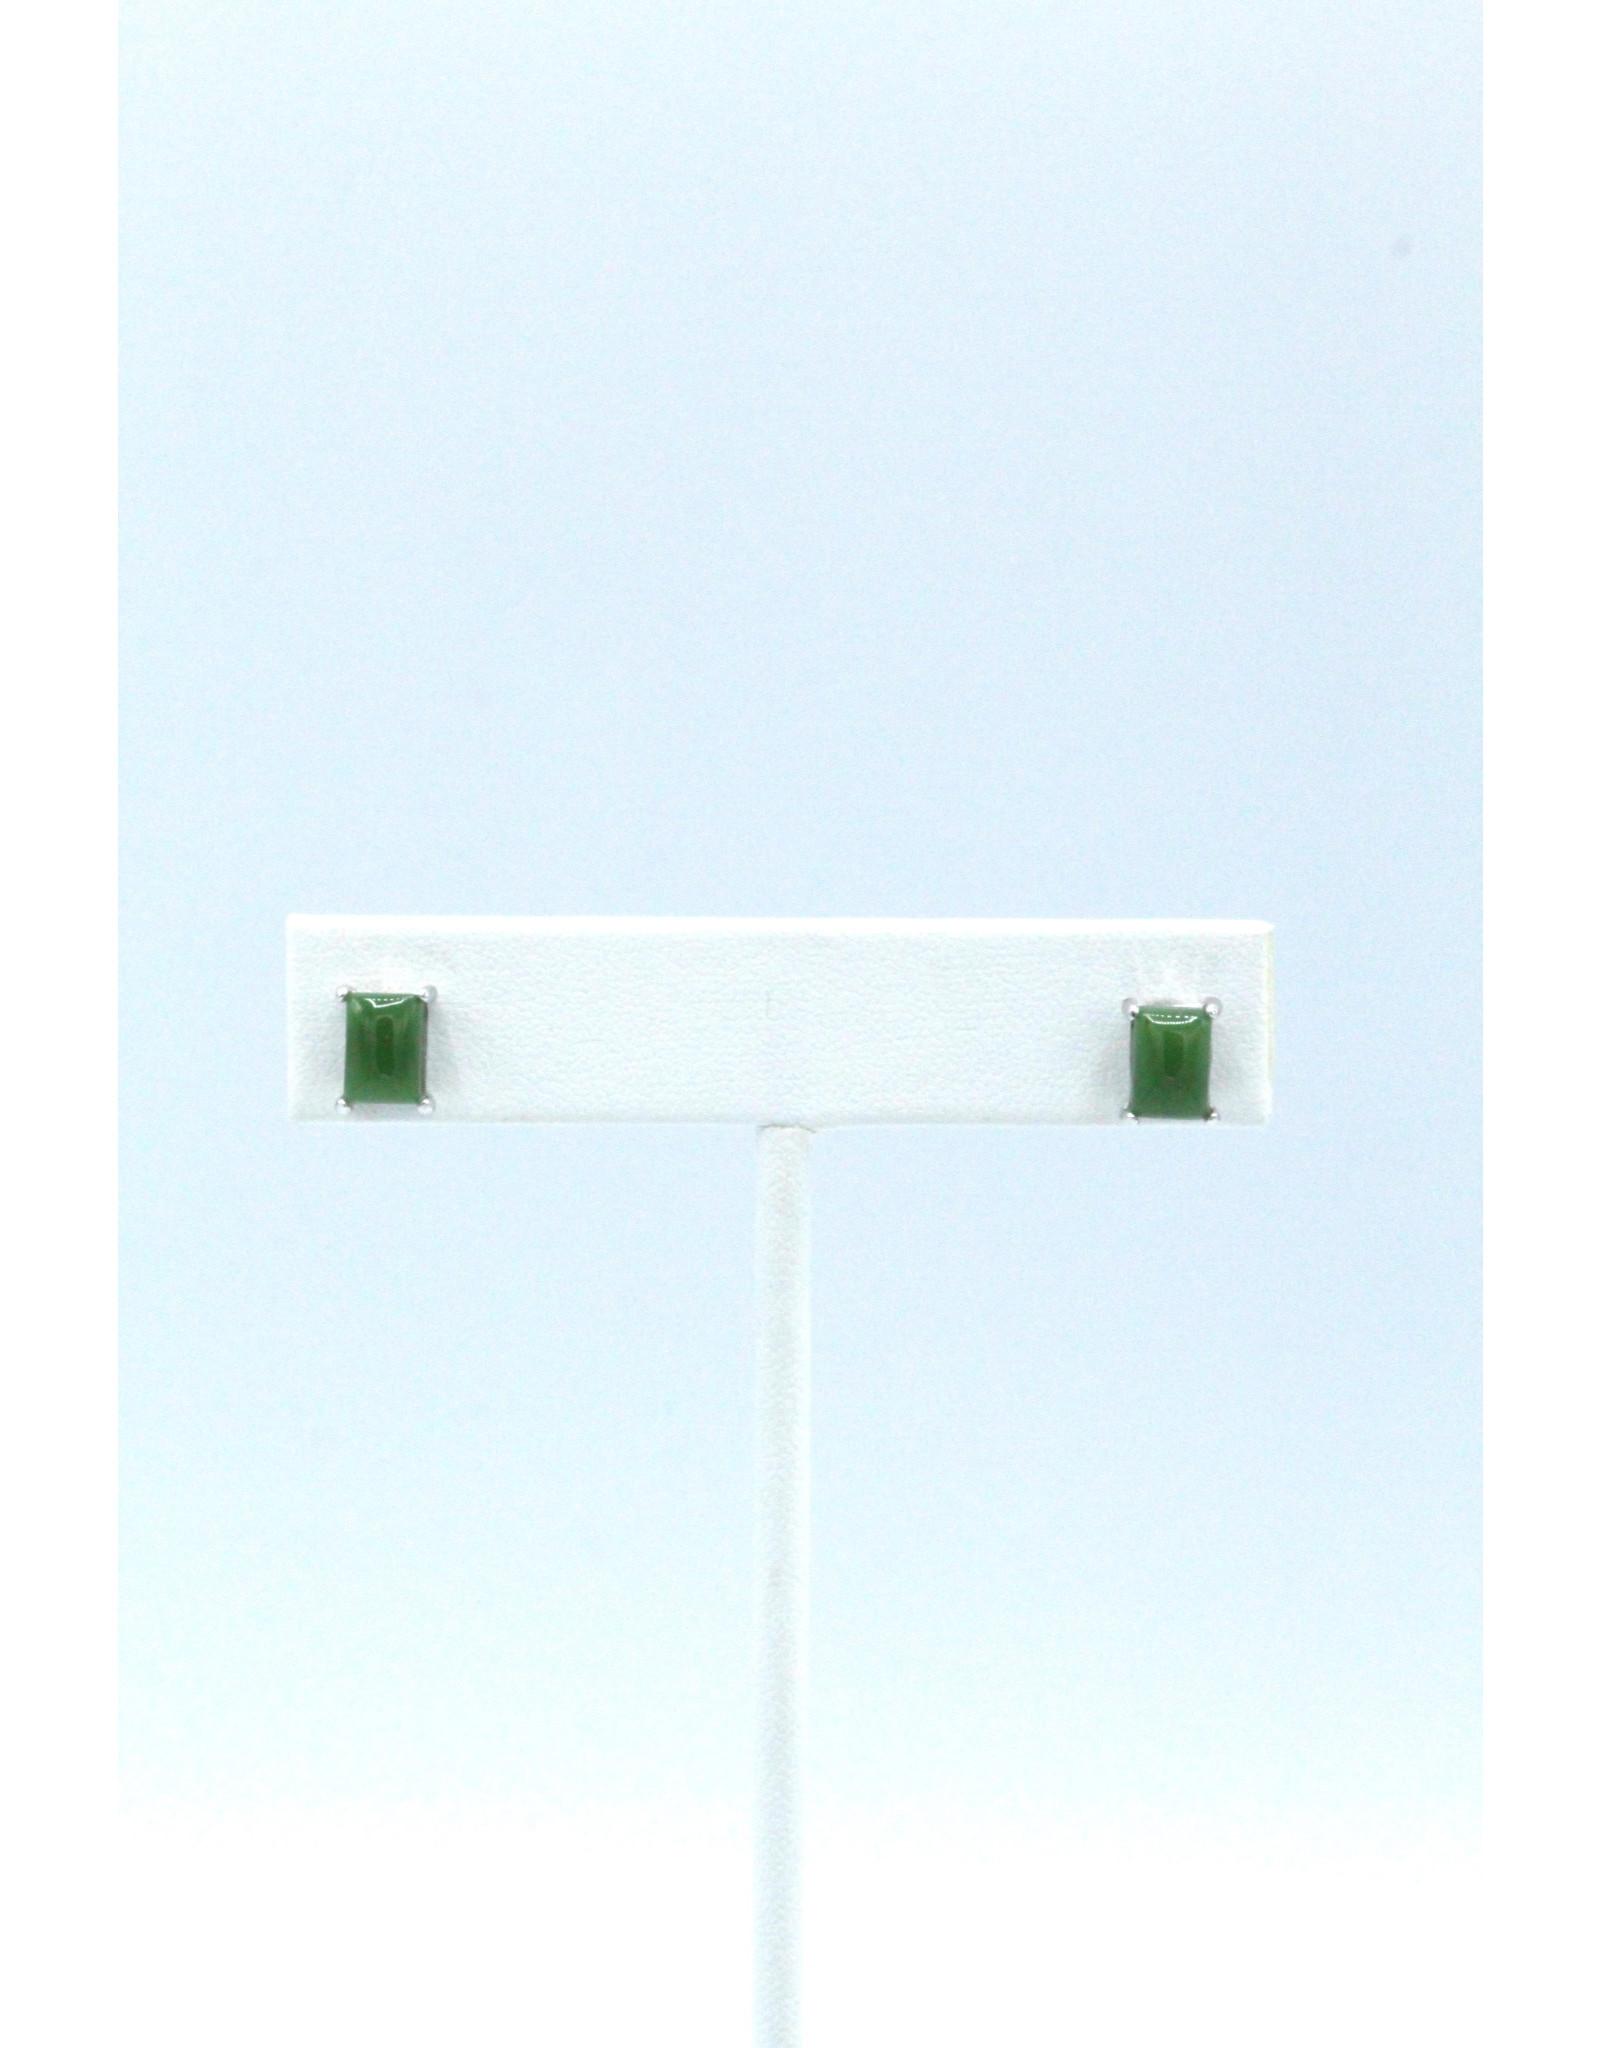 Rectangular Jade Earrings - JES58